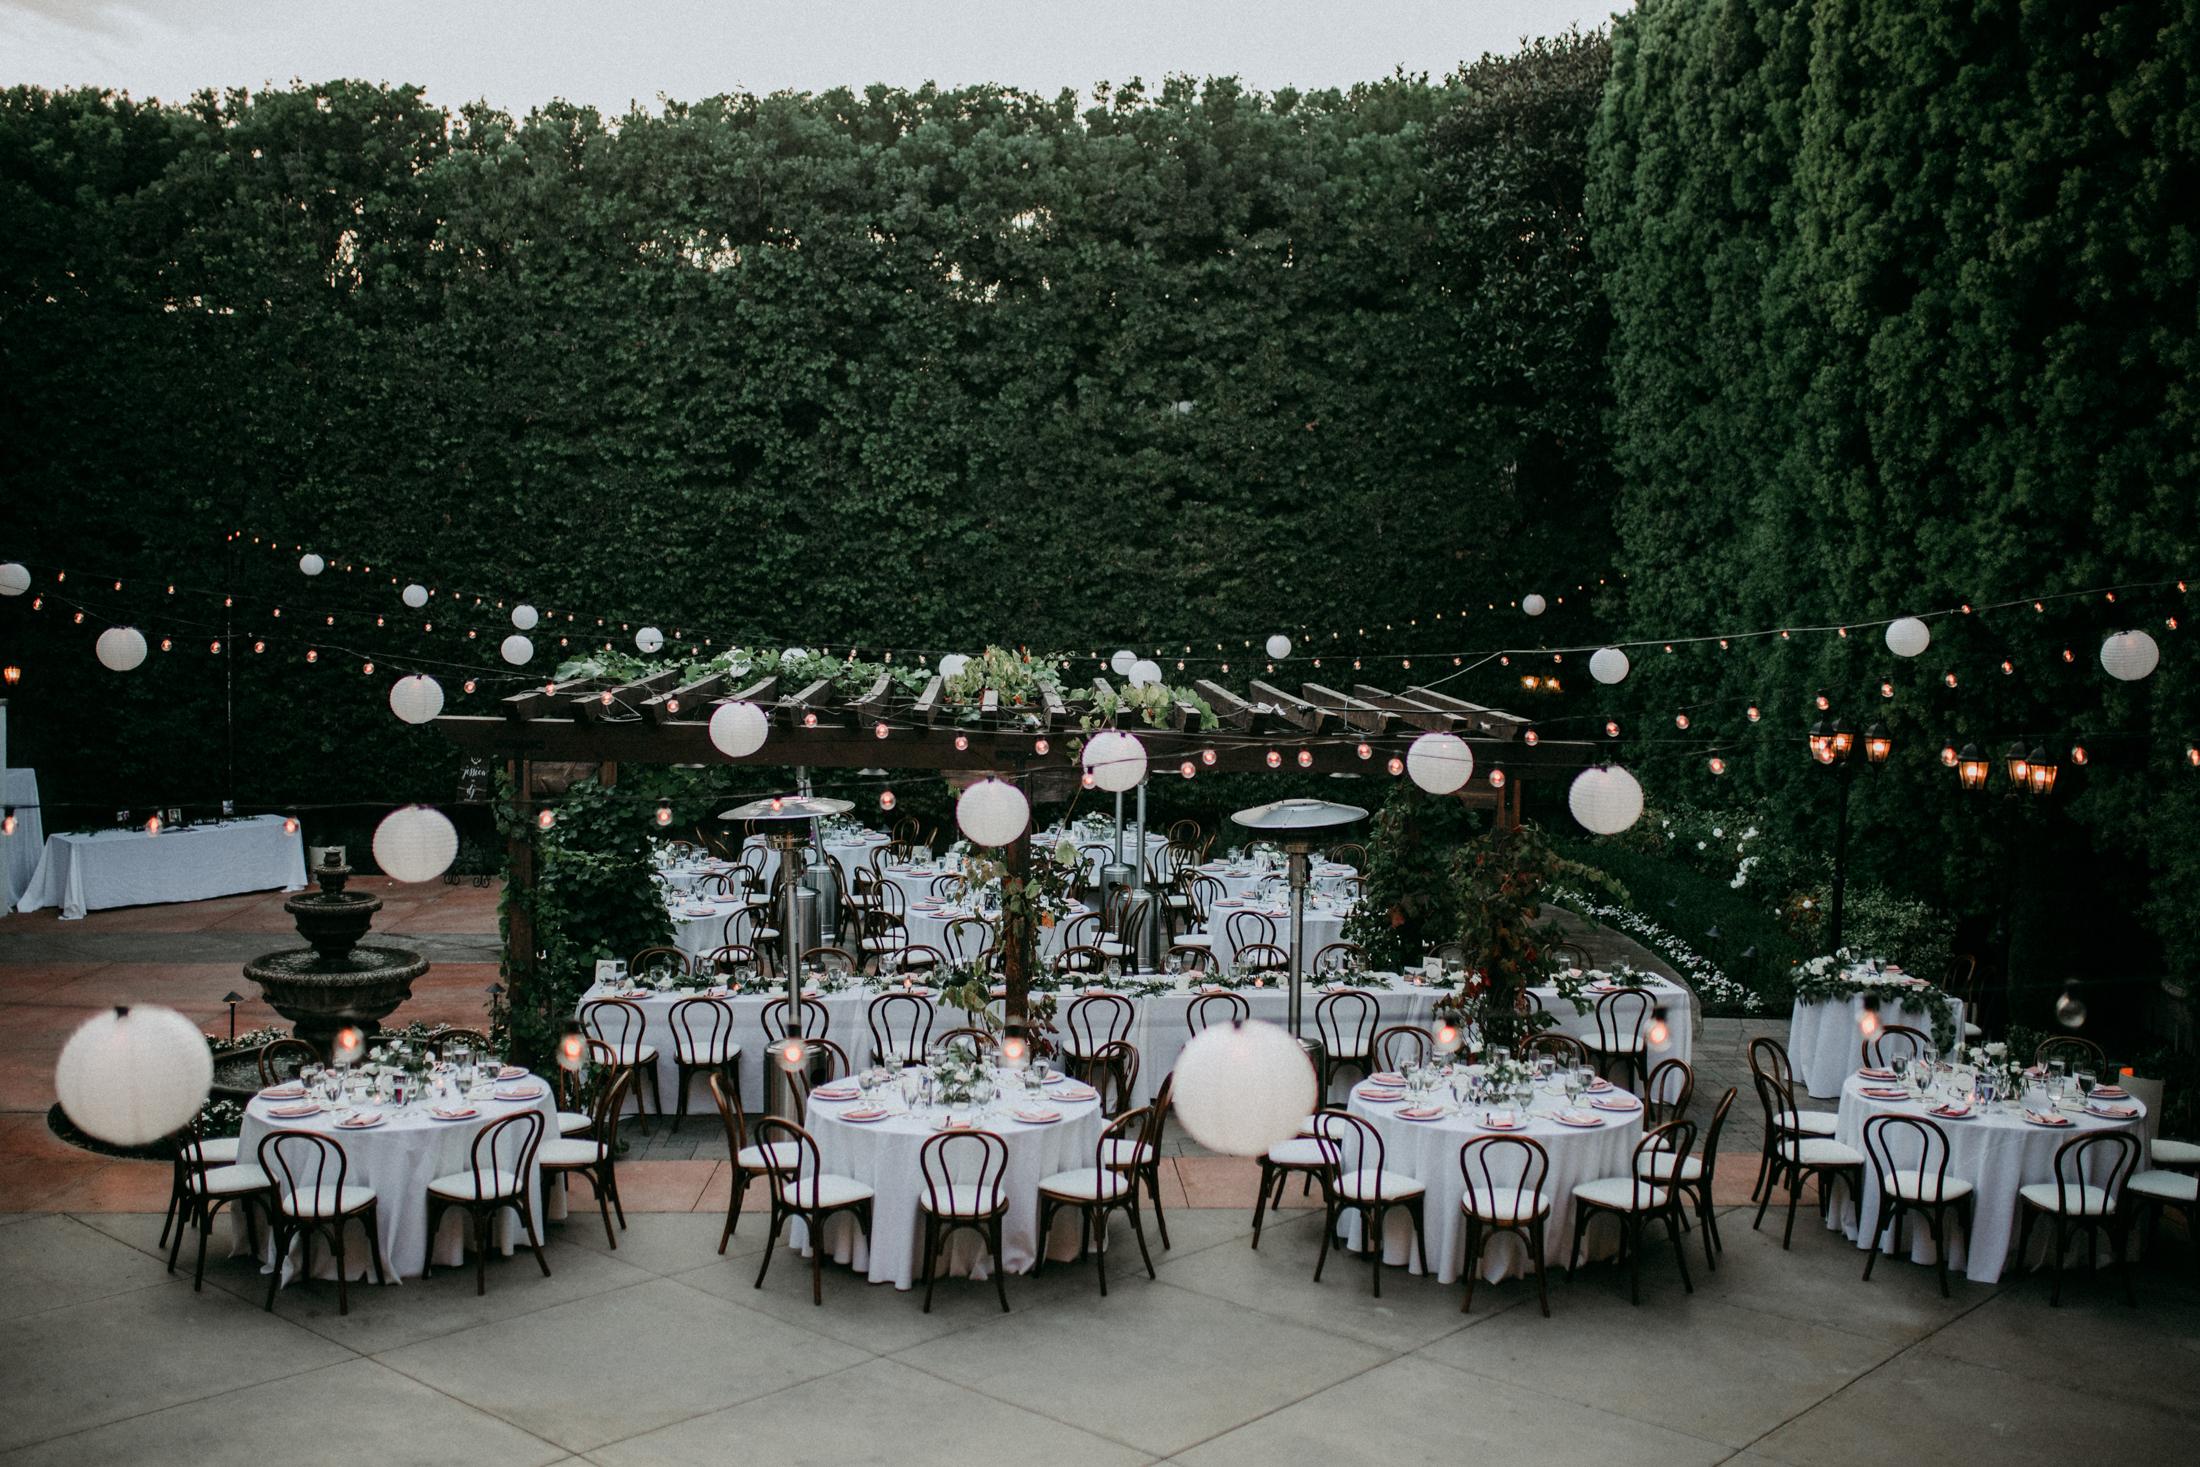 franciscan_garden_wedding-47.jpg